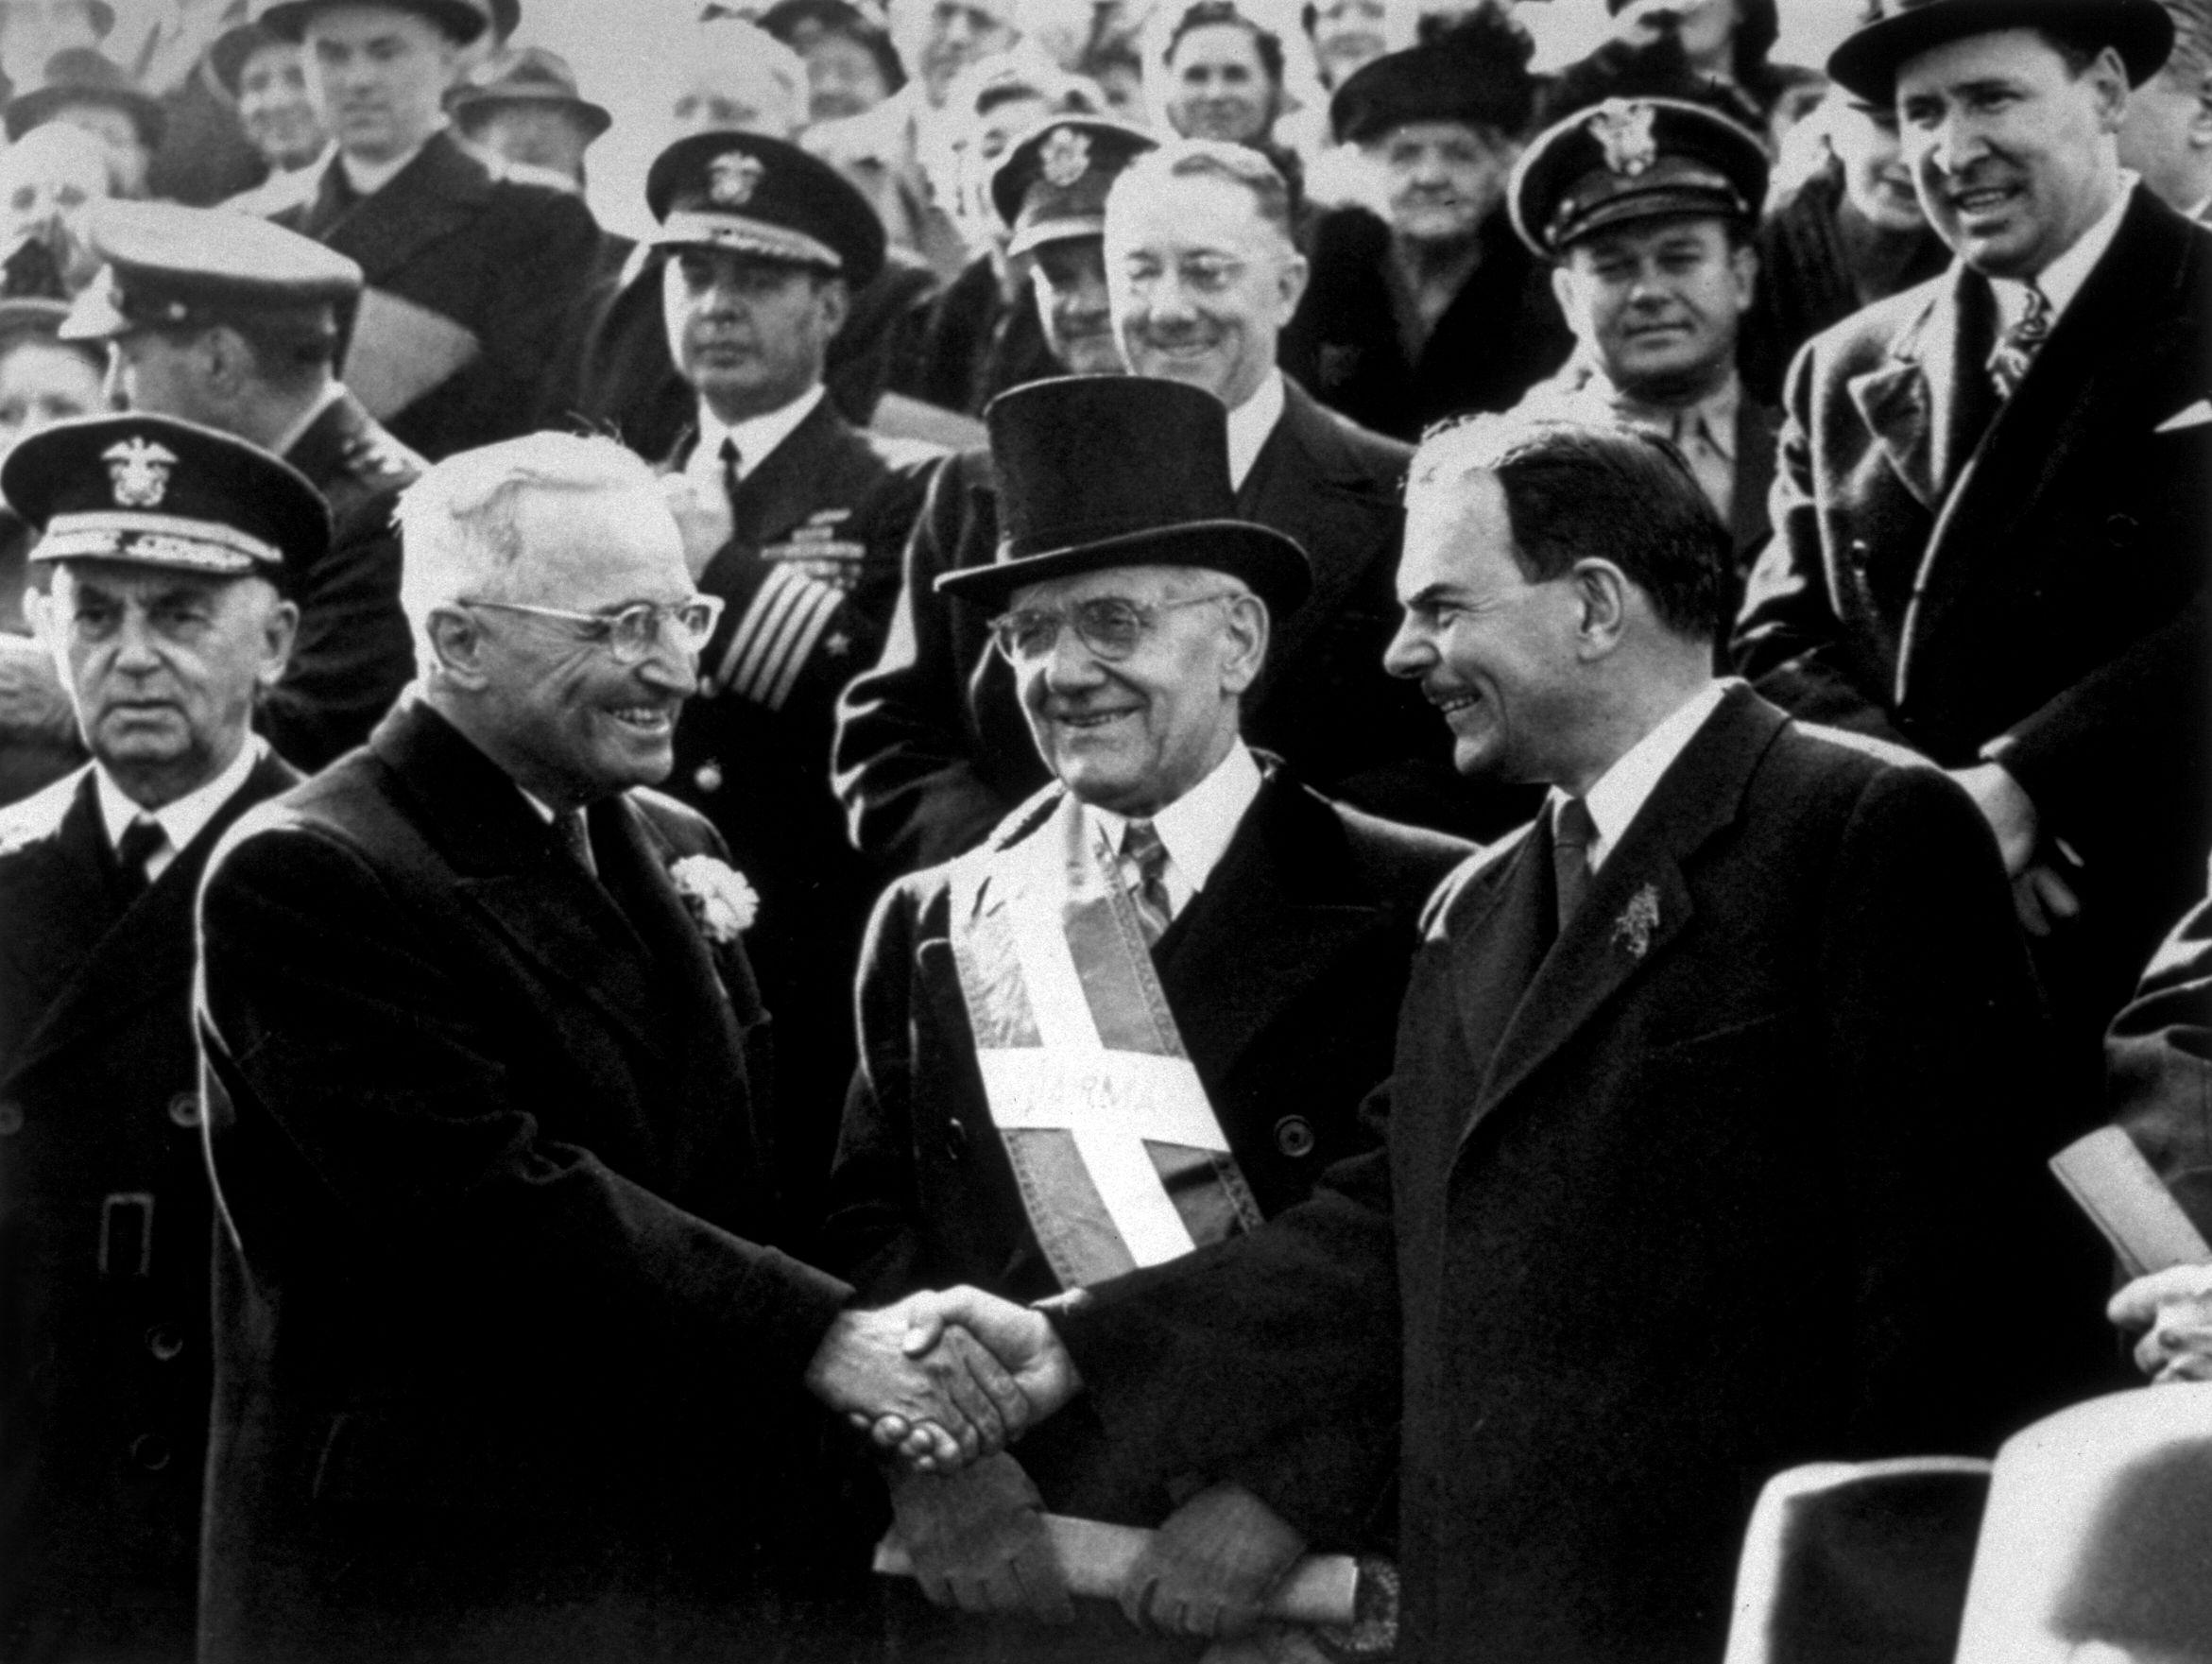 Truman and Dewey